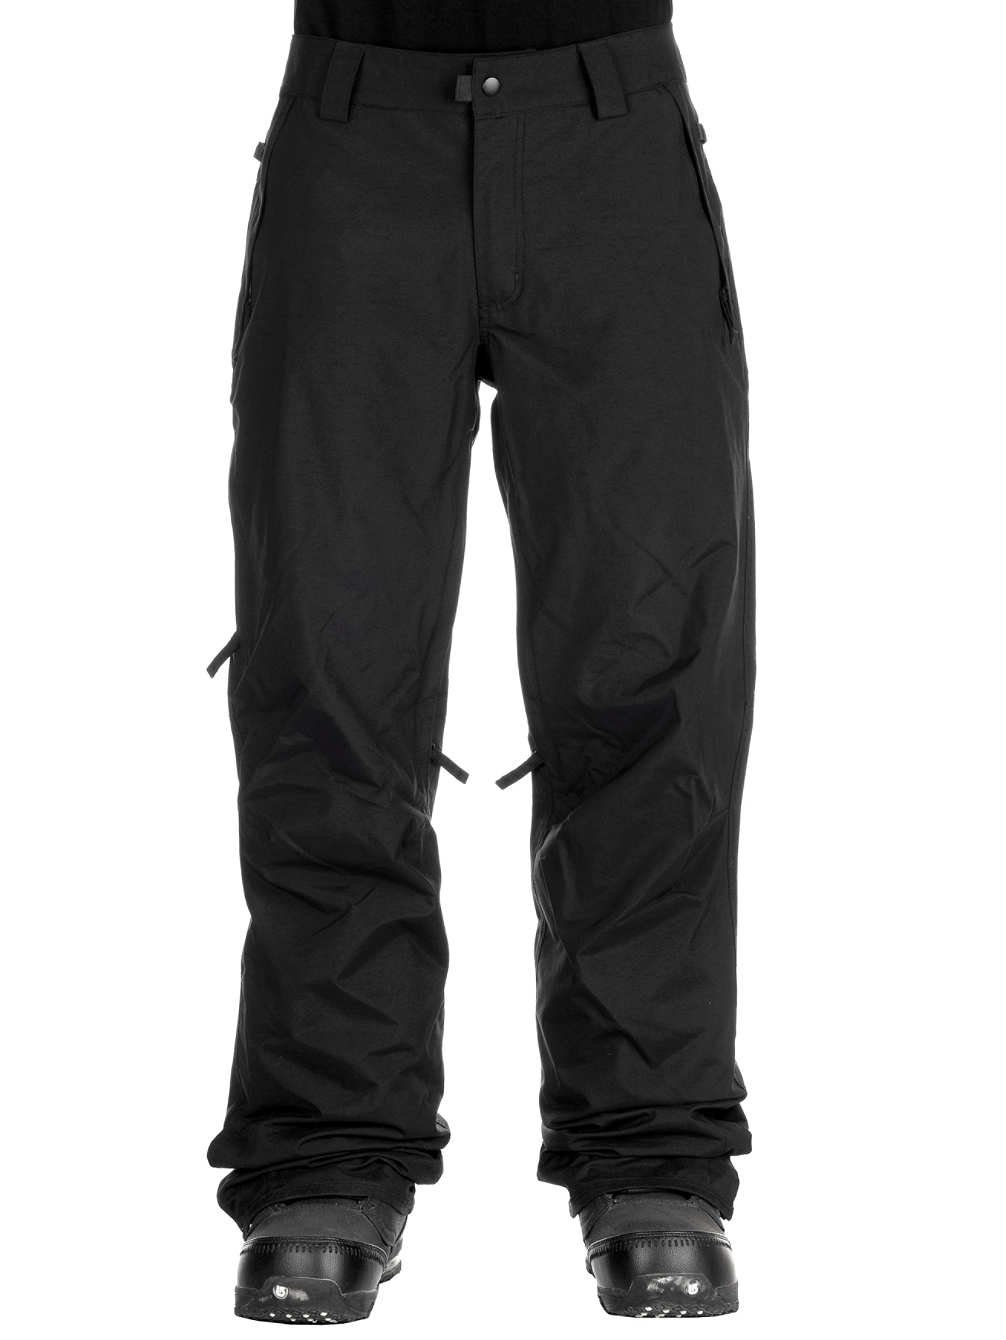 686 Standard Mens Snowboard Pants KCR213